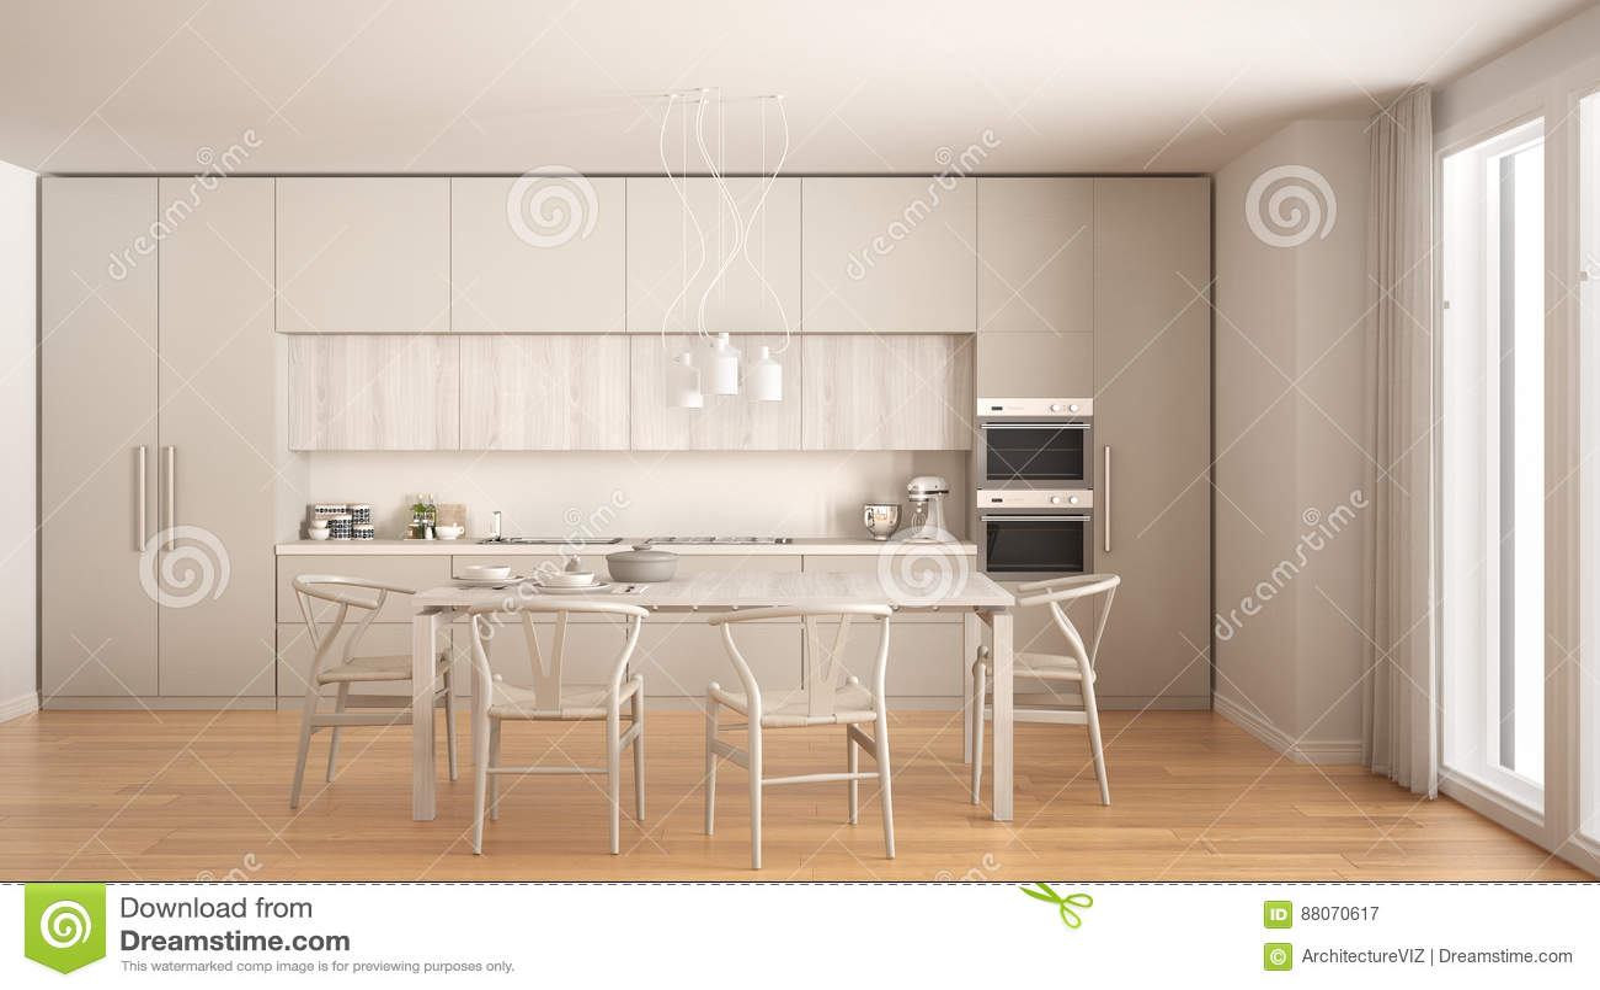 wood floors in kitchen complete outdoor kits 有木地板的 经典内部现代最小的白色厨房库存图片 图片包括有厨具 颜色 经典内部现代最小的白色厨房